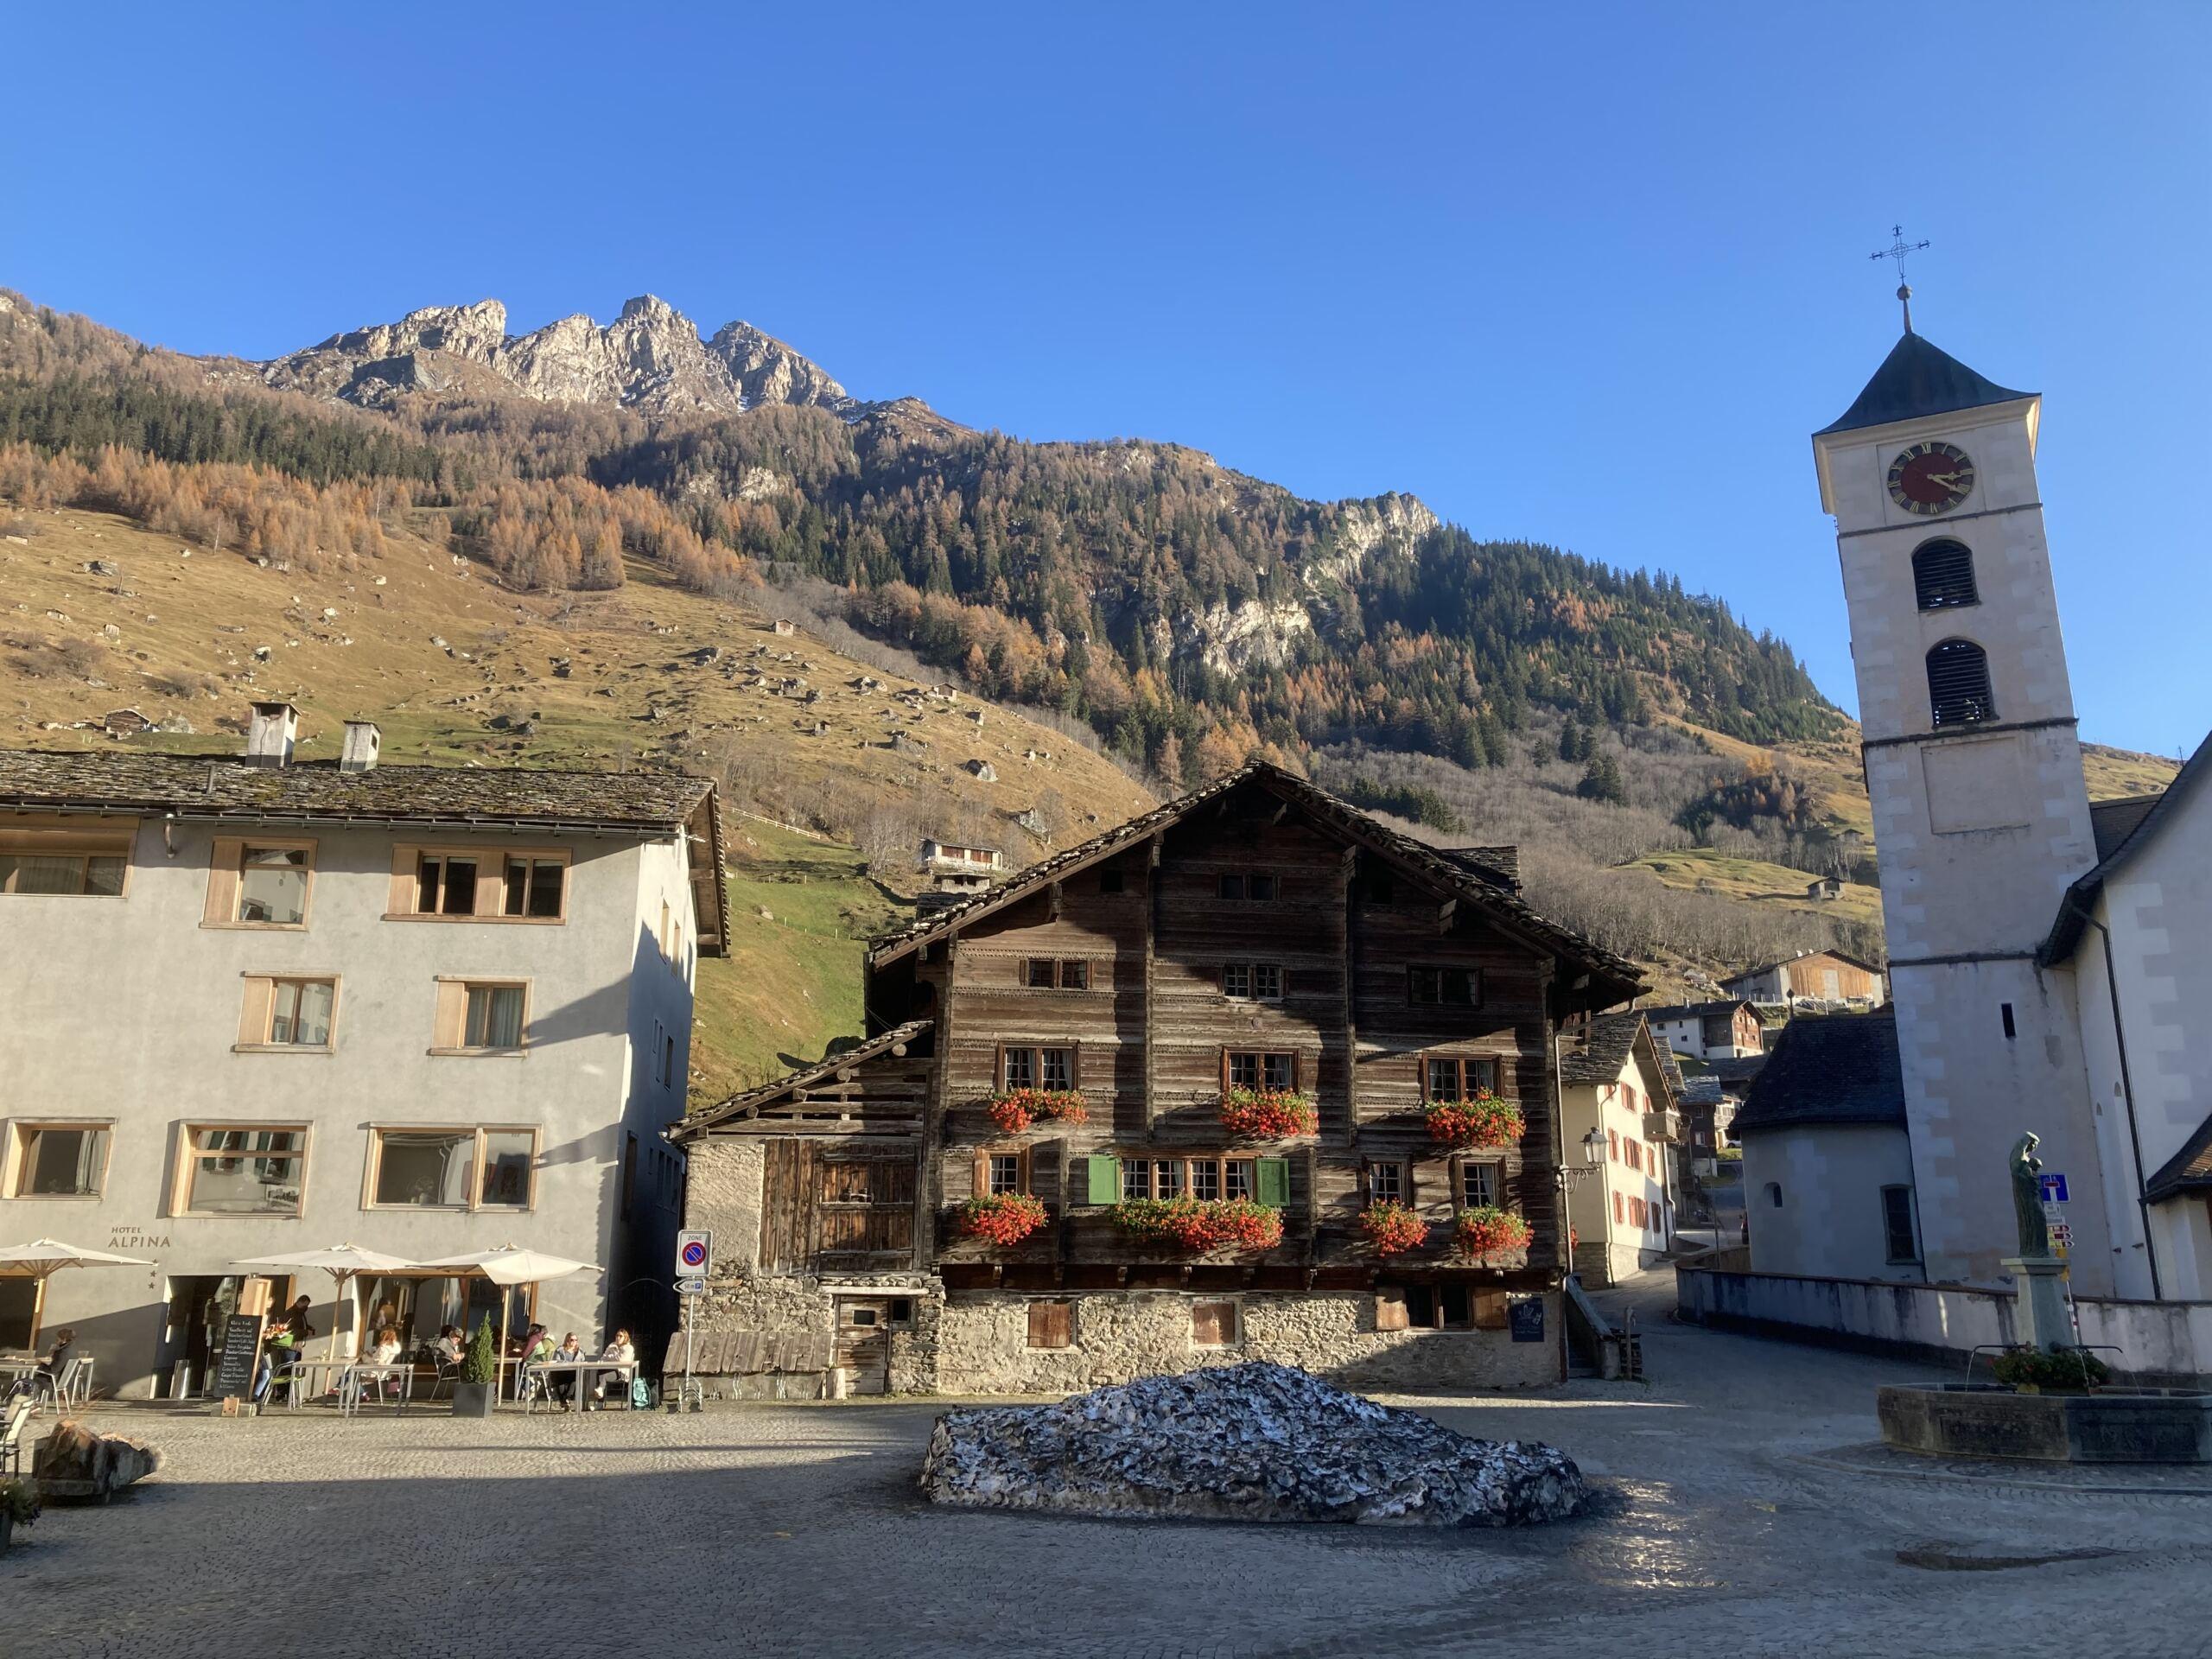 Dorfplatz in Vals